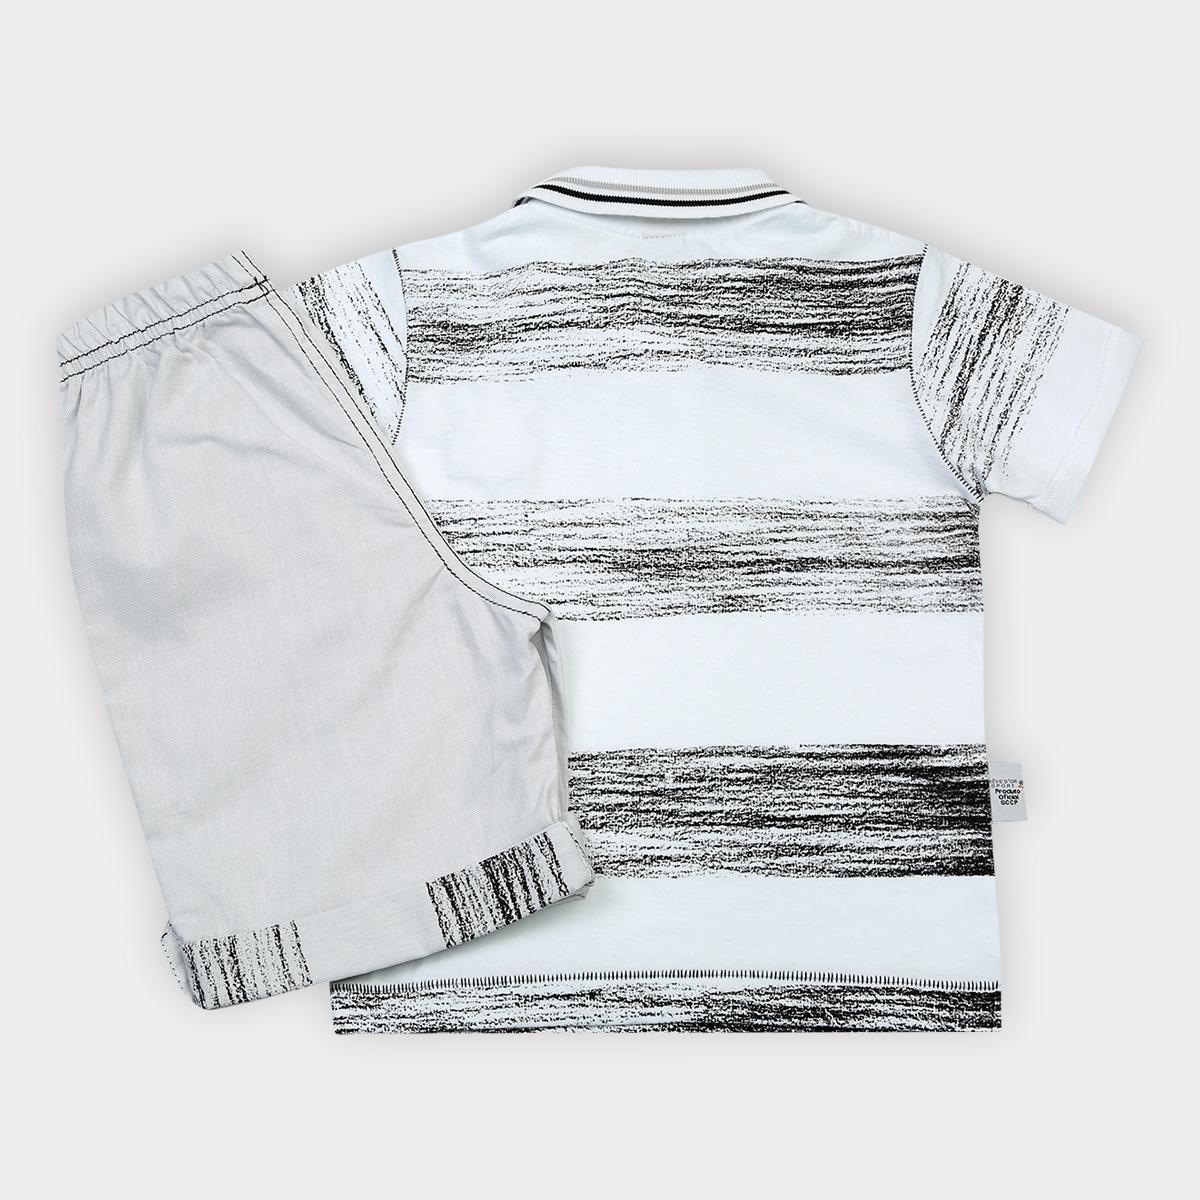 d1142ad6e023a Foto 2 - Conjunto Corinthians Infantil Camisa Polo e Bermuda